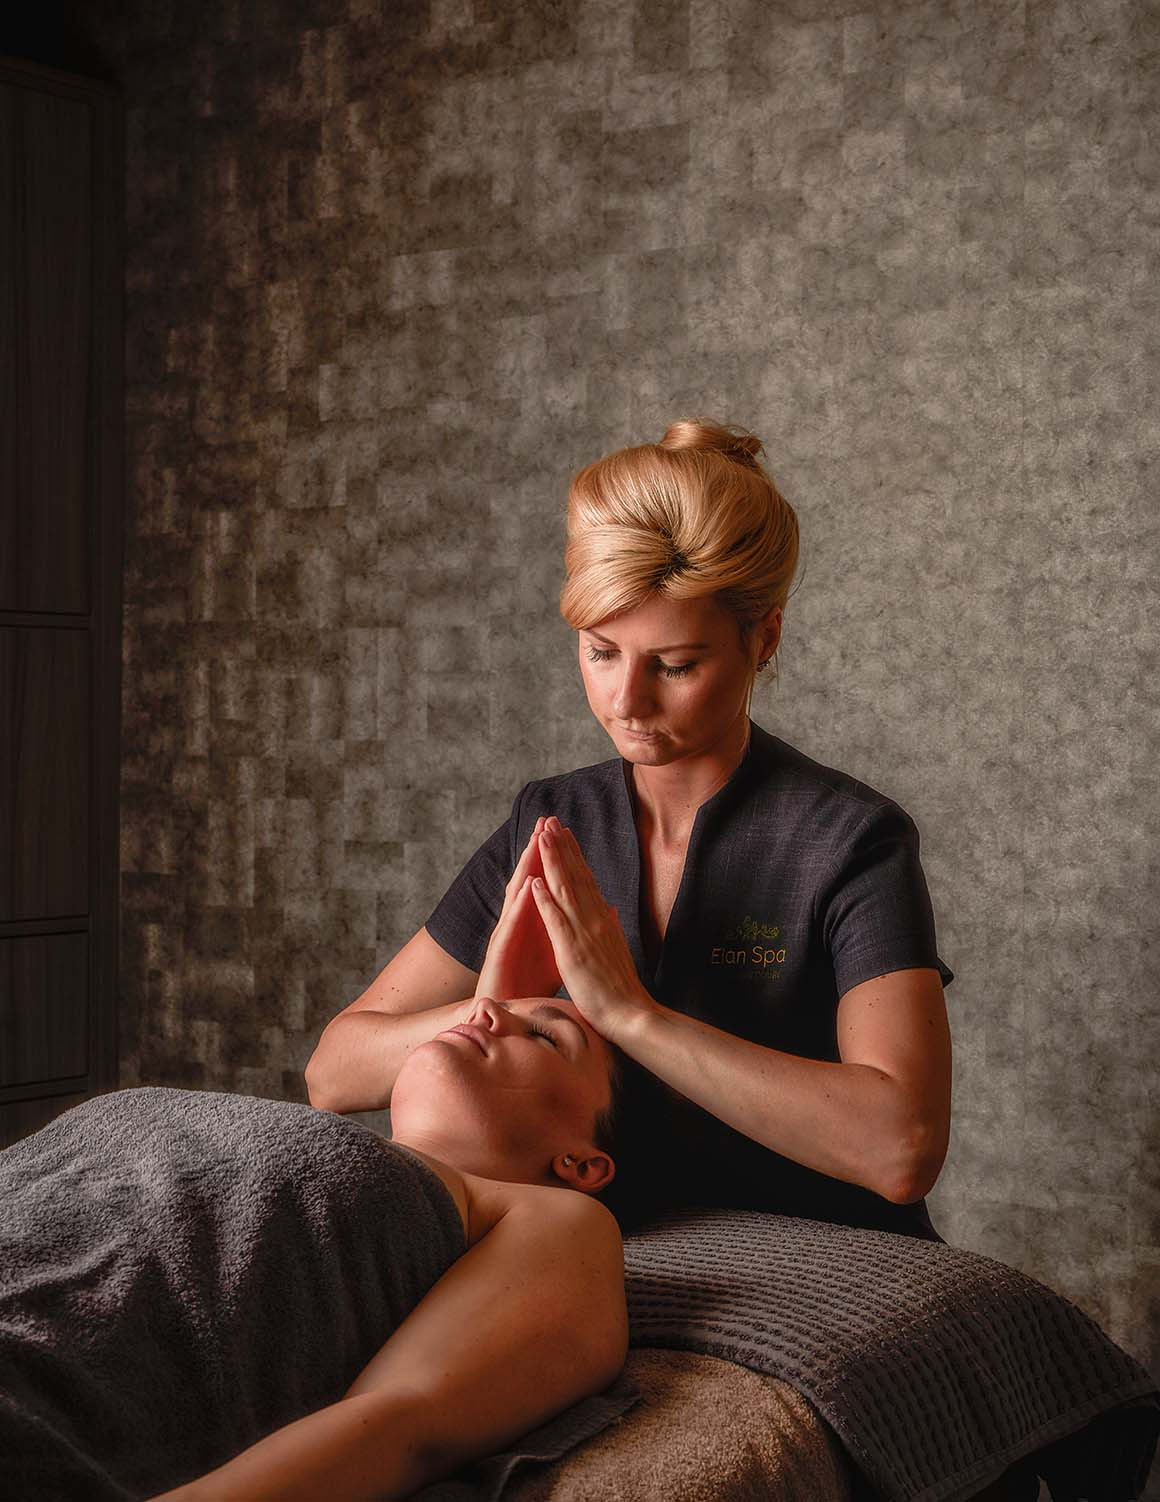 Spa therapist treatment